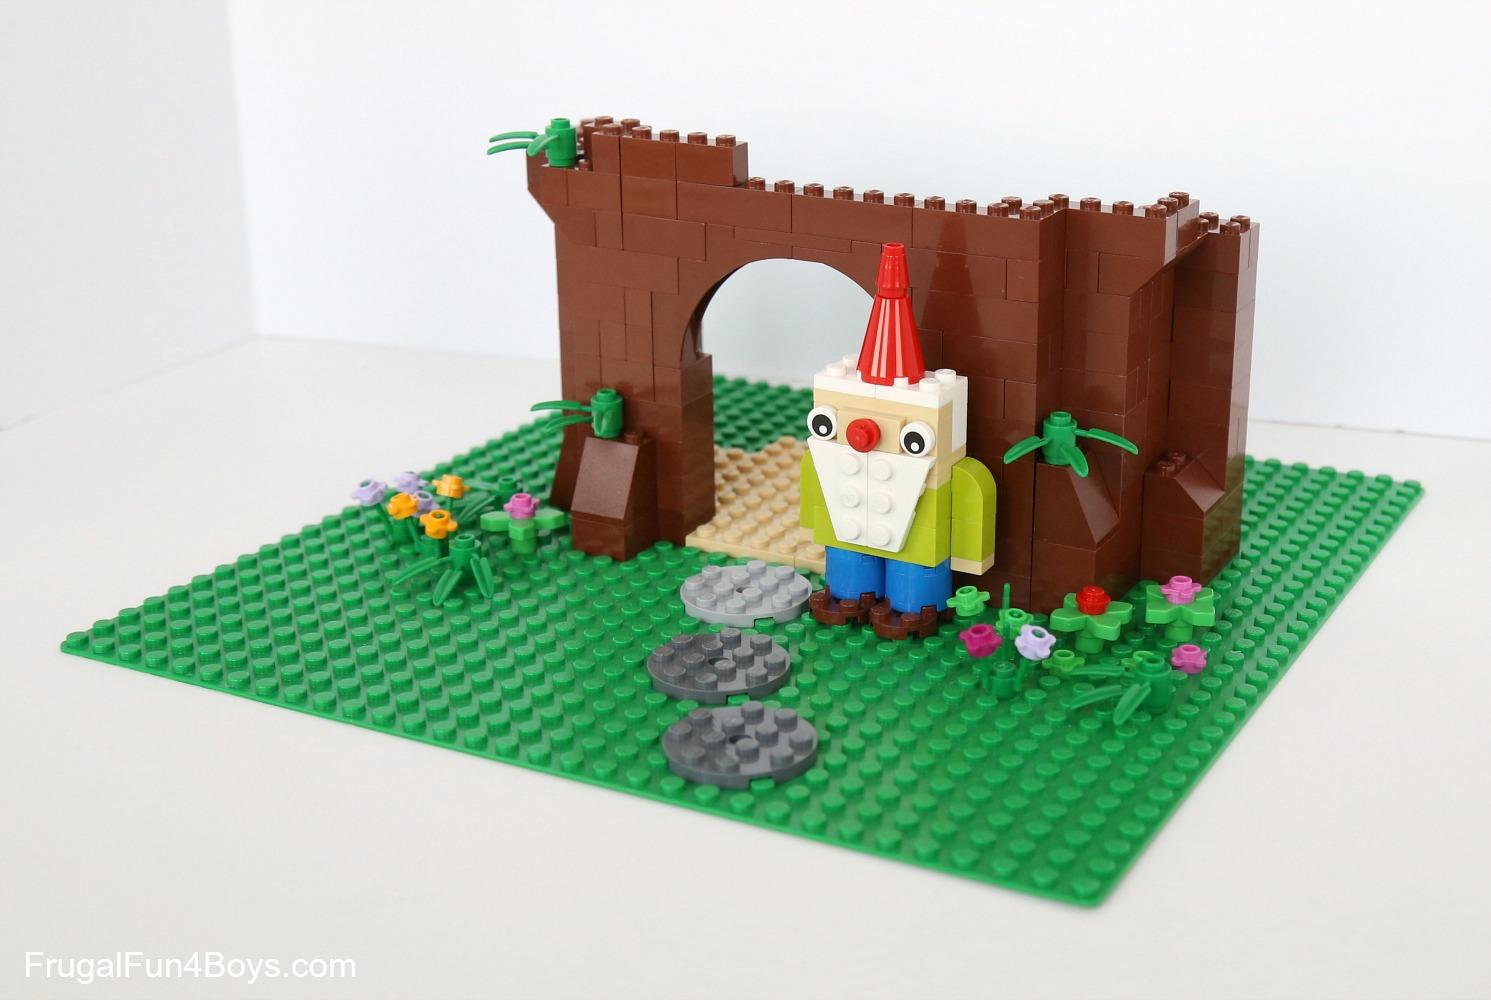 Build A Lego Gnome Garden Frugal Fun For Boys And Girls